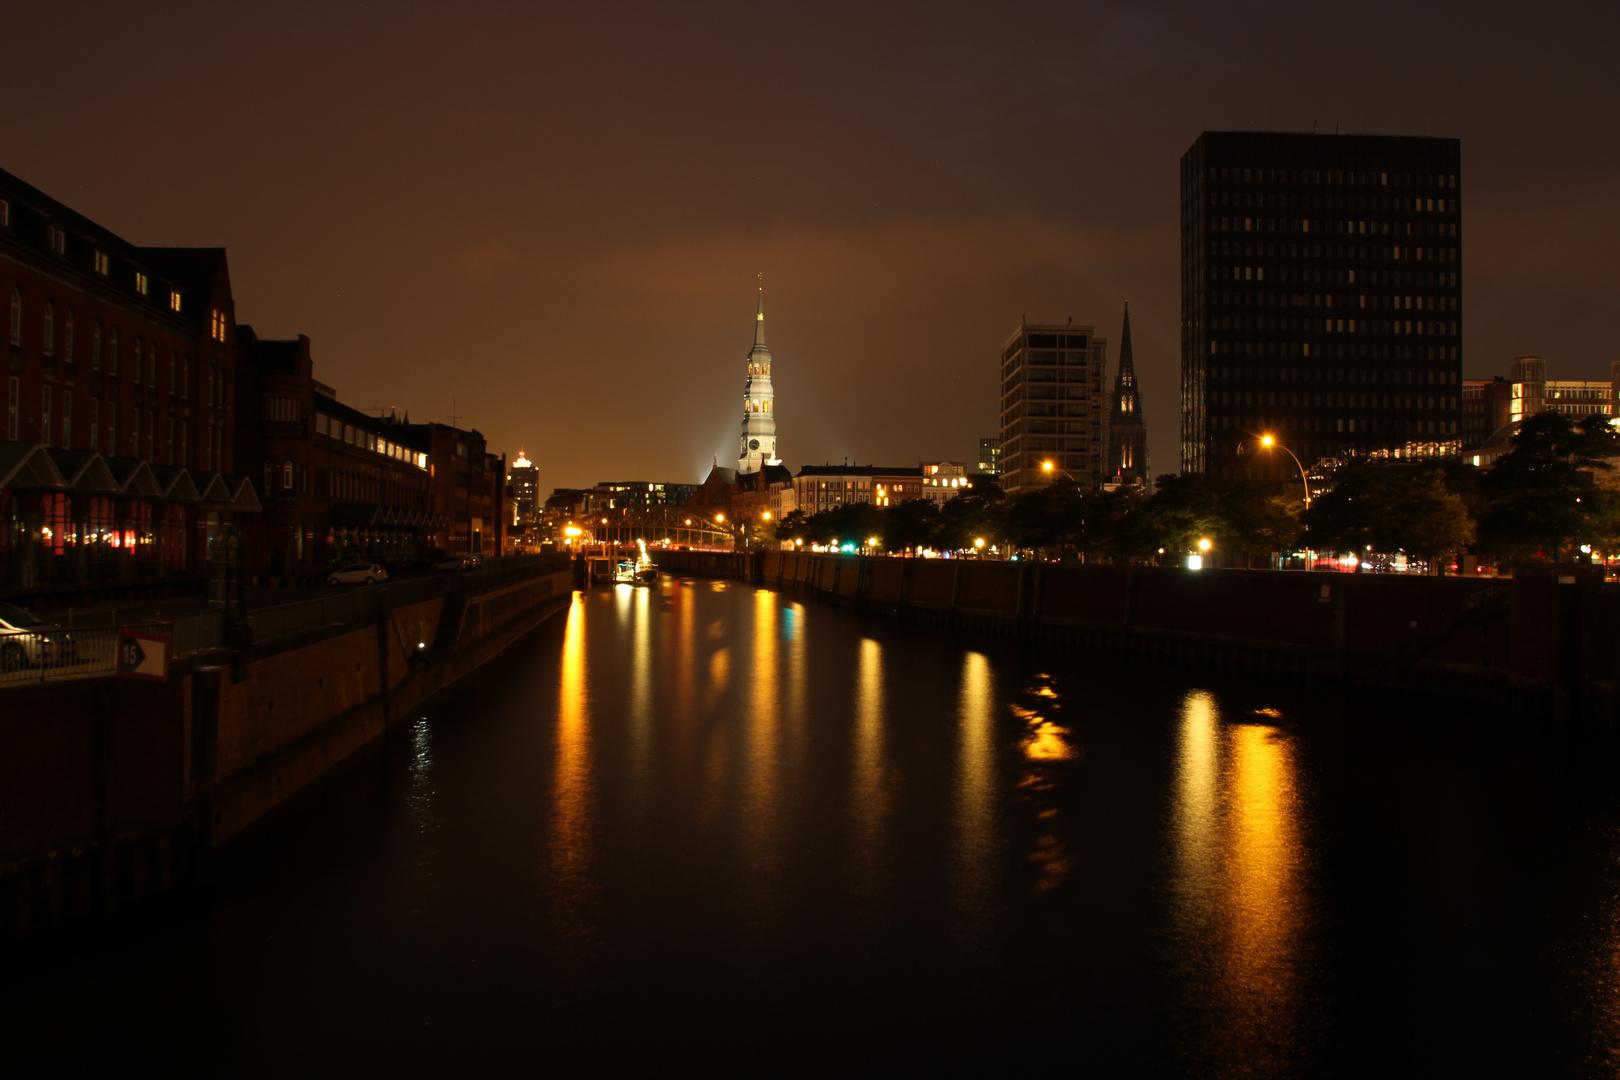 Hafen City - Blaue Stunde III